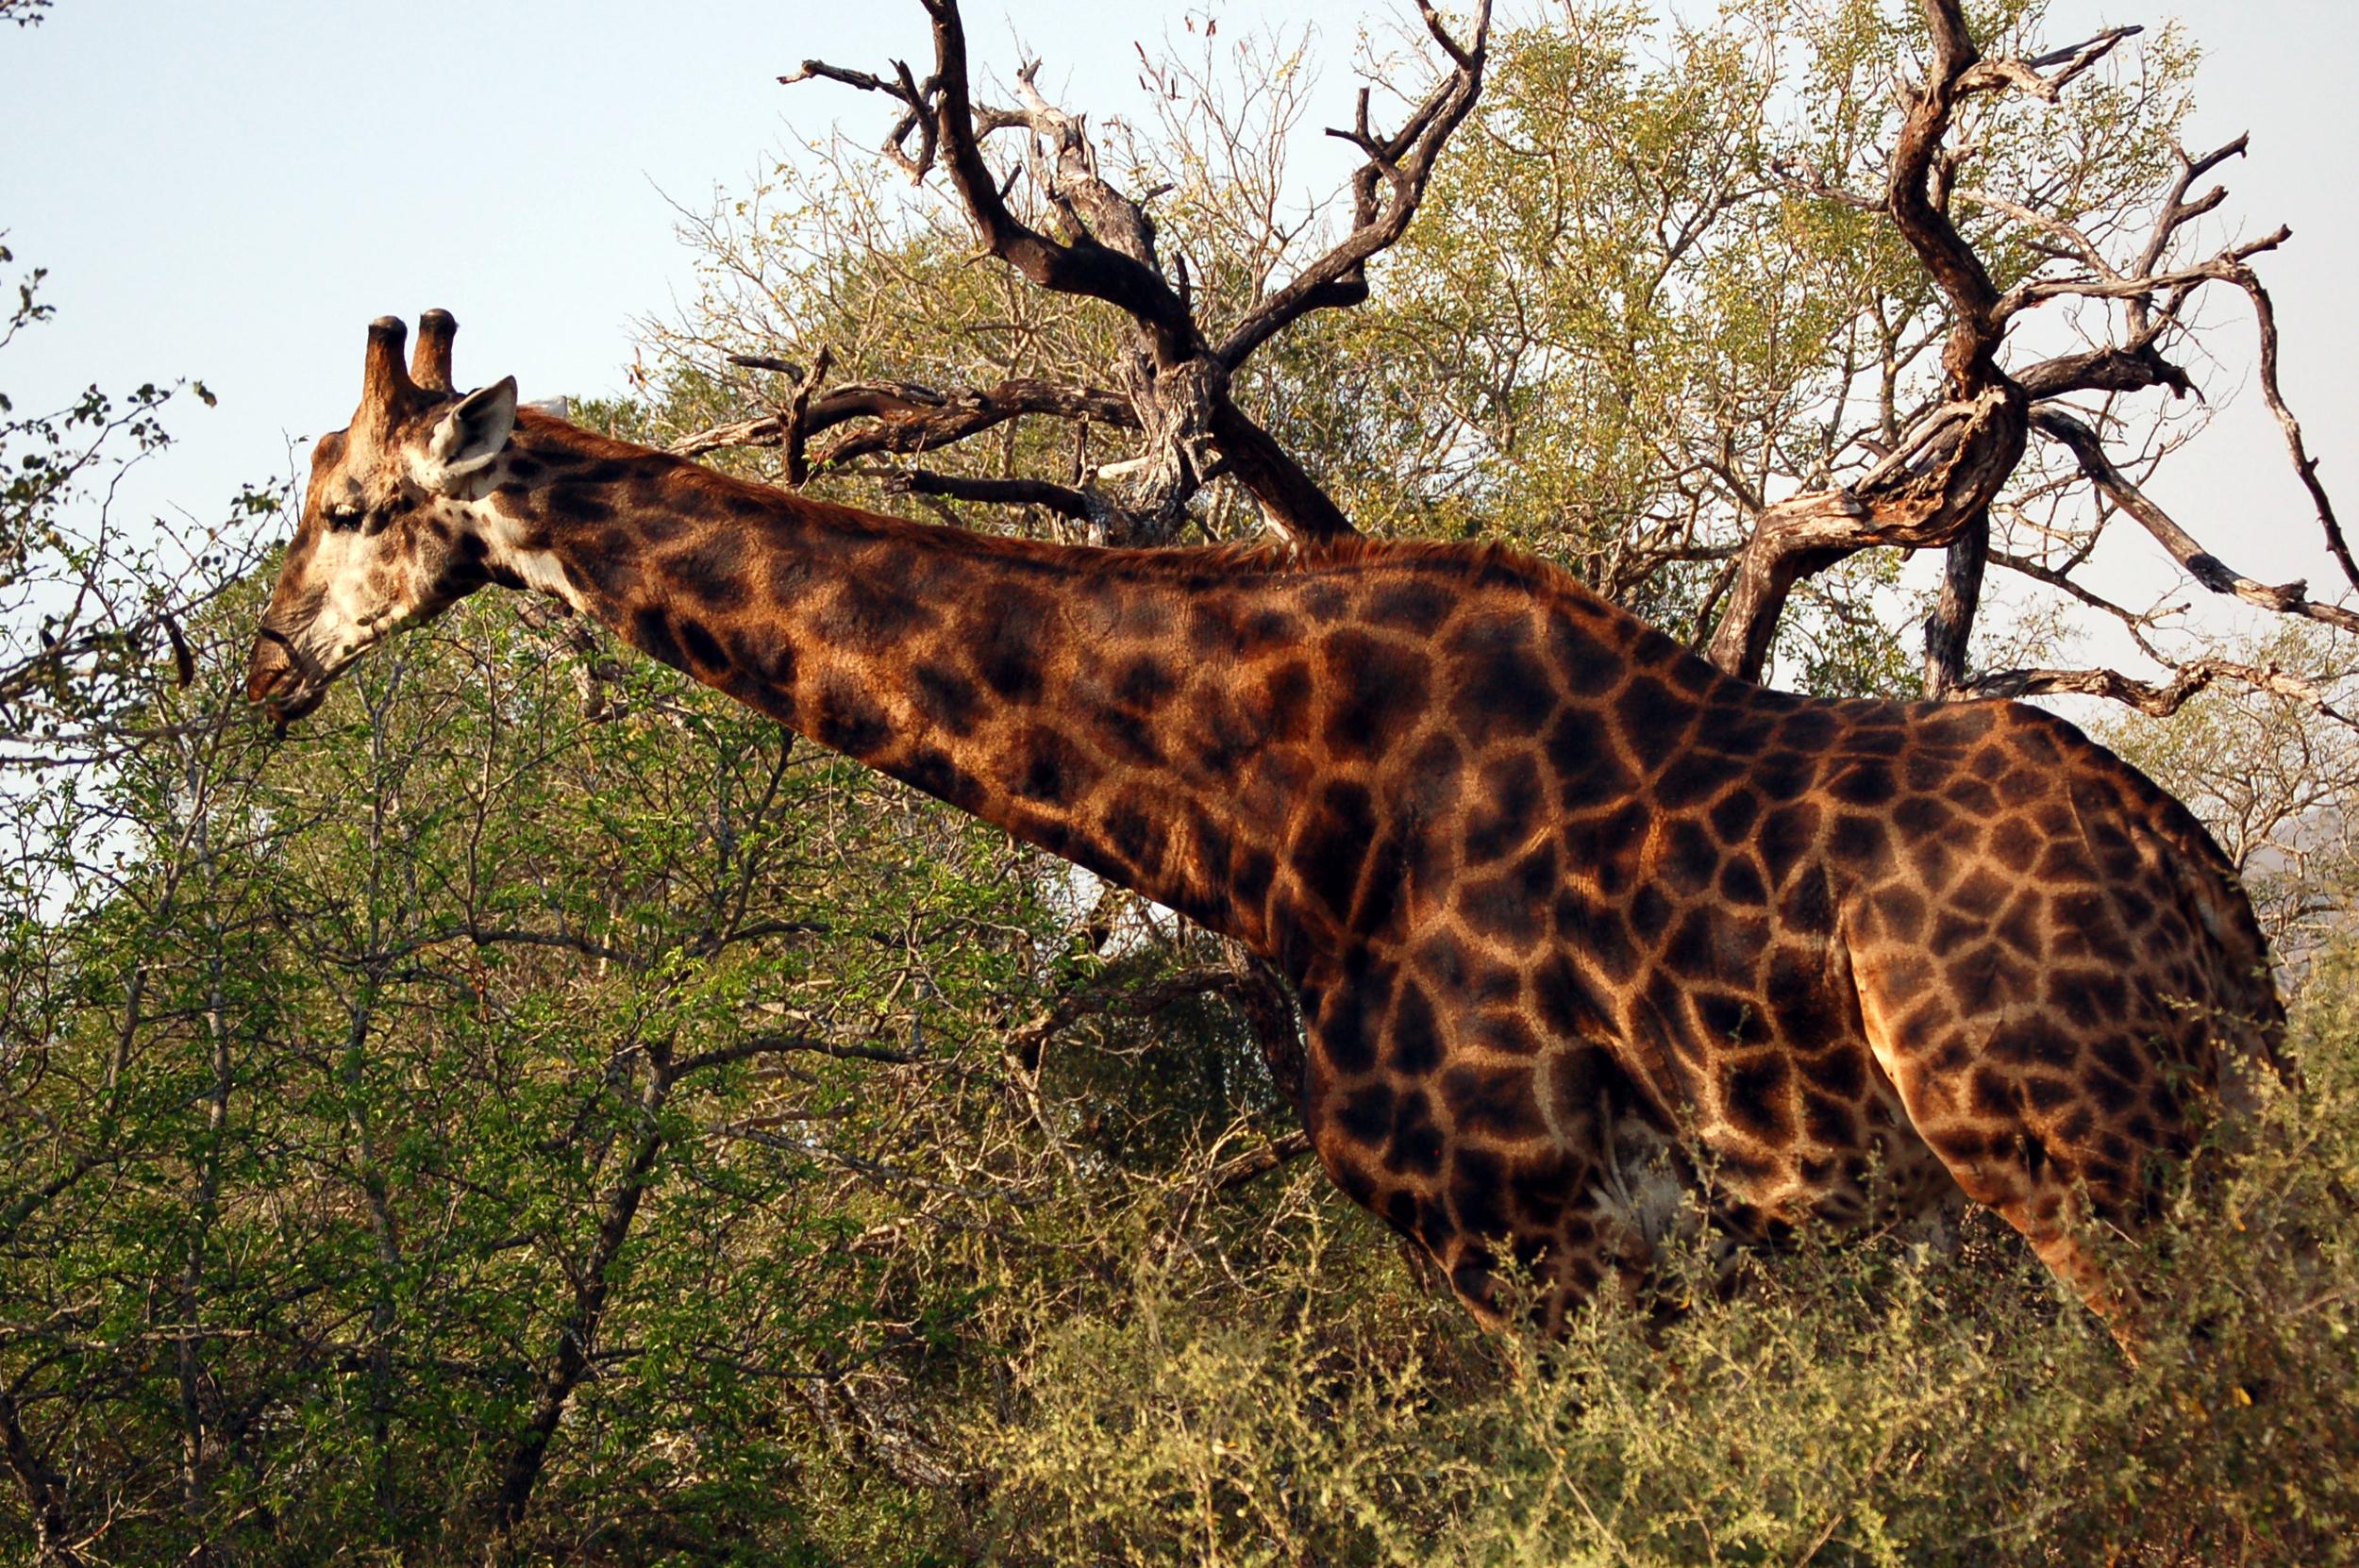 Bull Giraffe